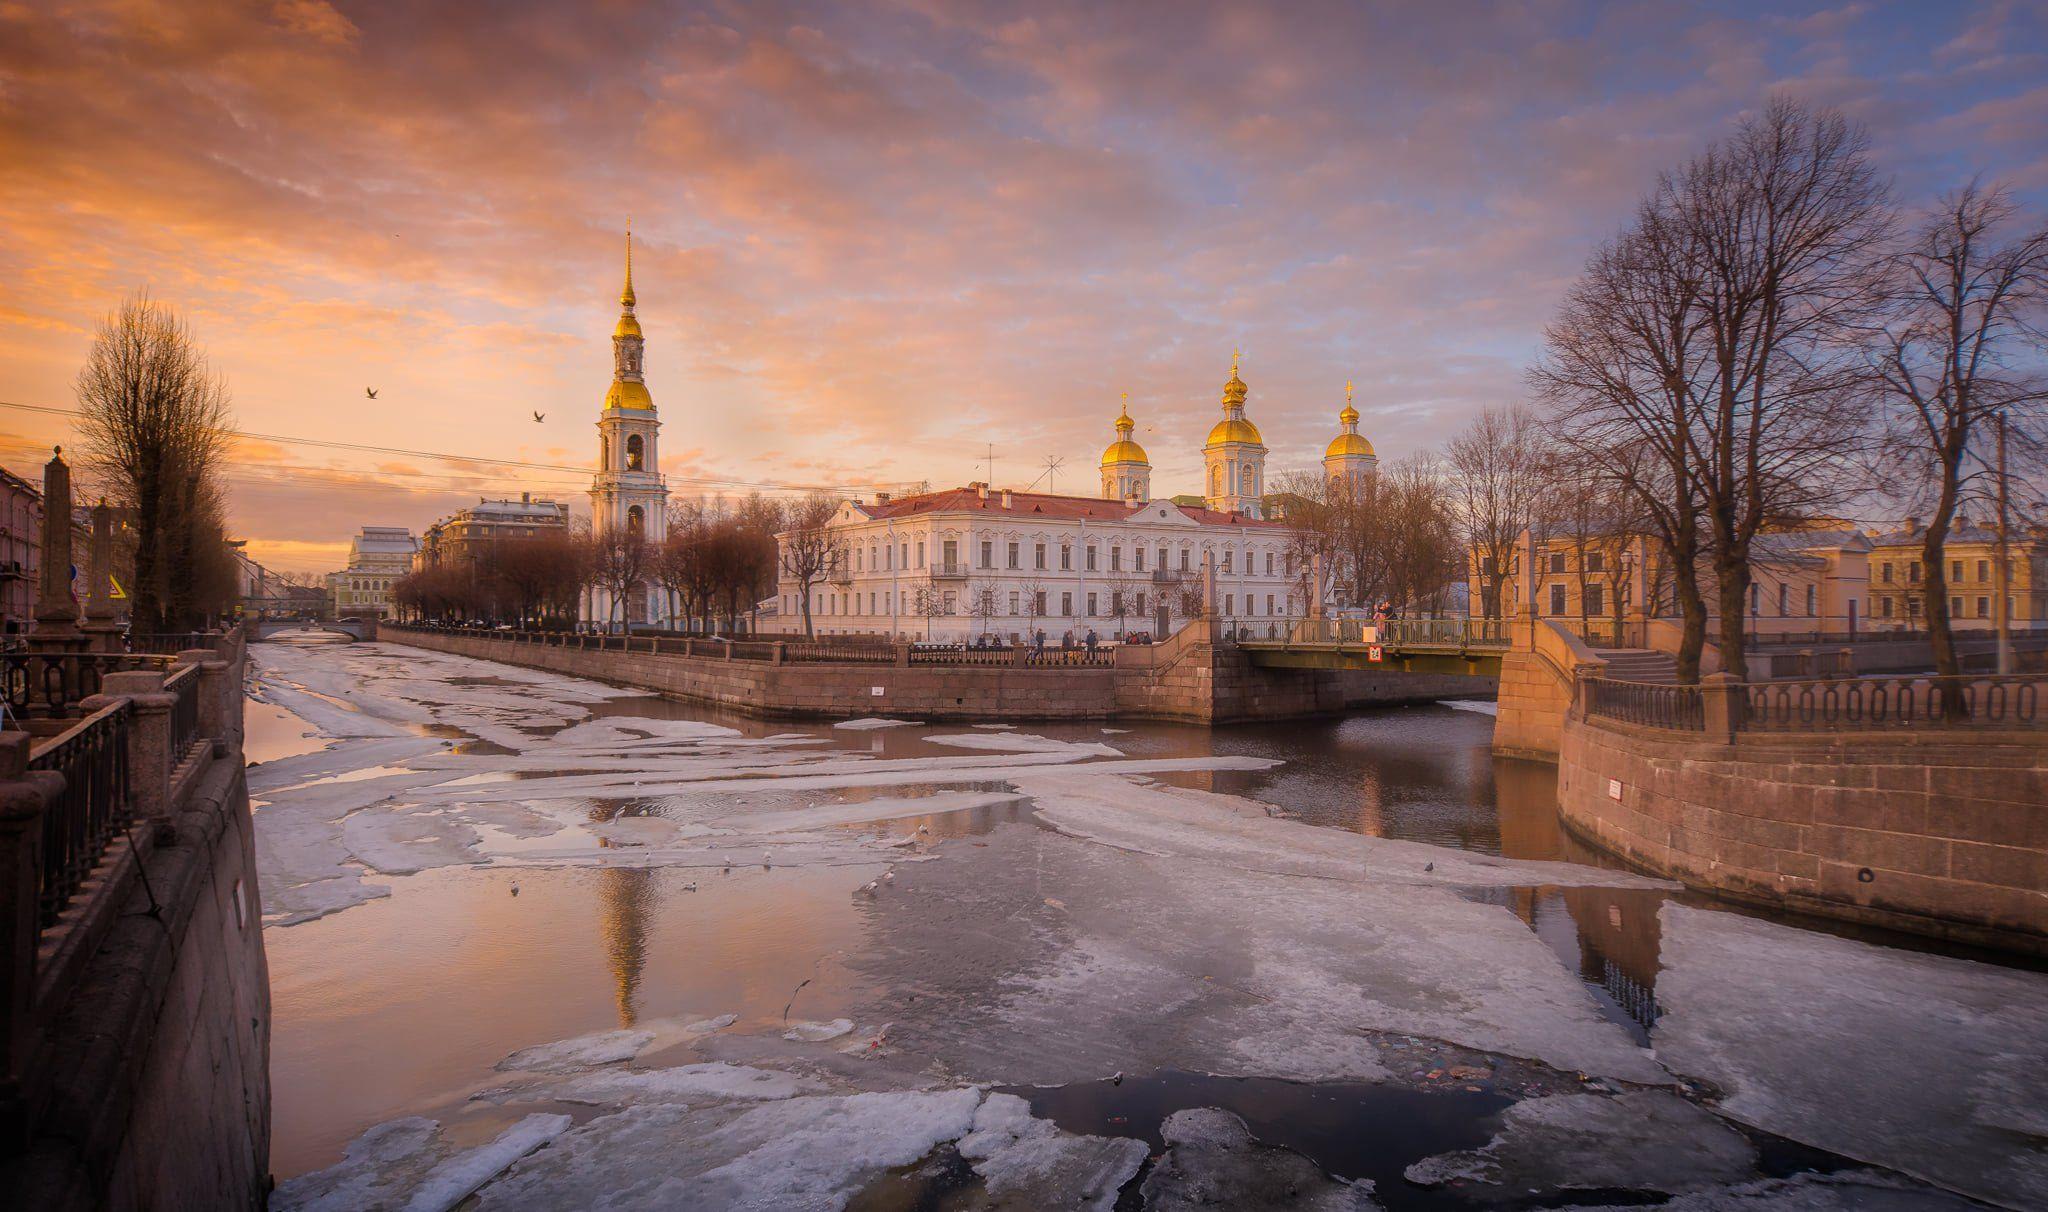 петербург, город, мост, вода, река, рассвет, пейзаж, закат, Khlebnikova Ekaterina